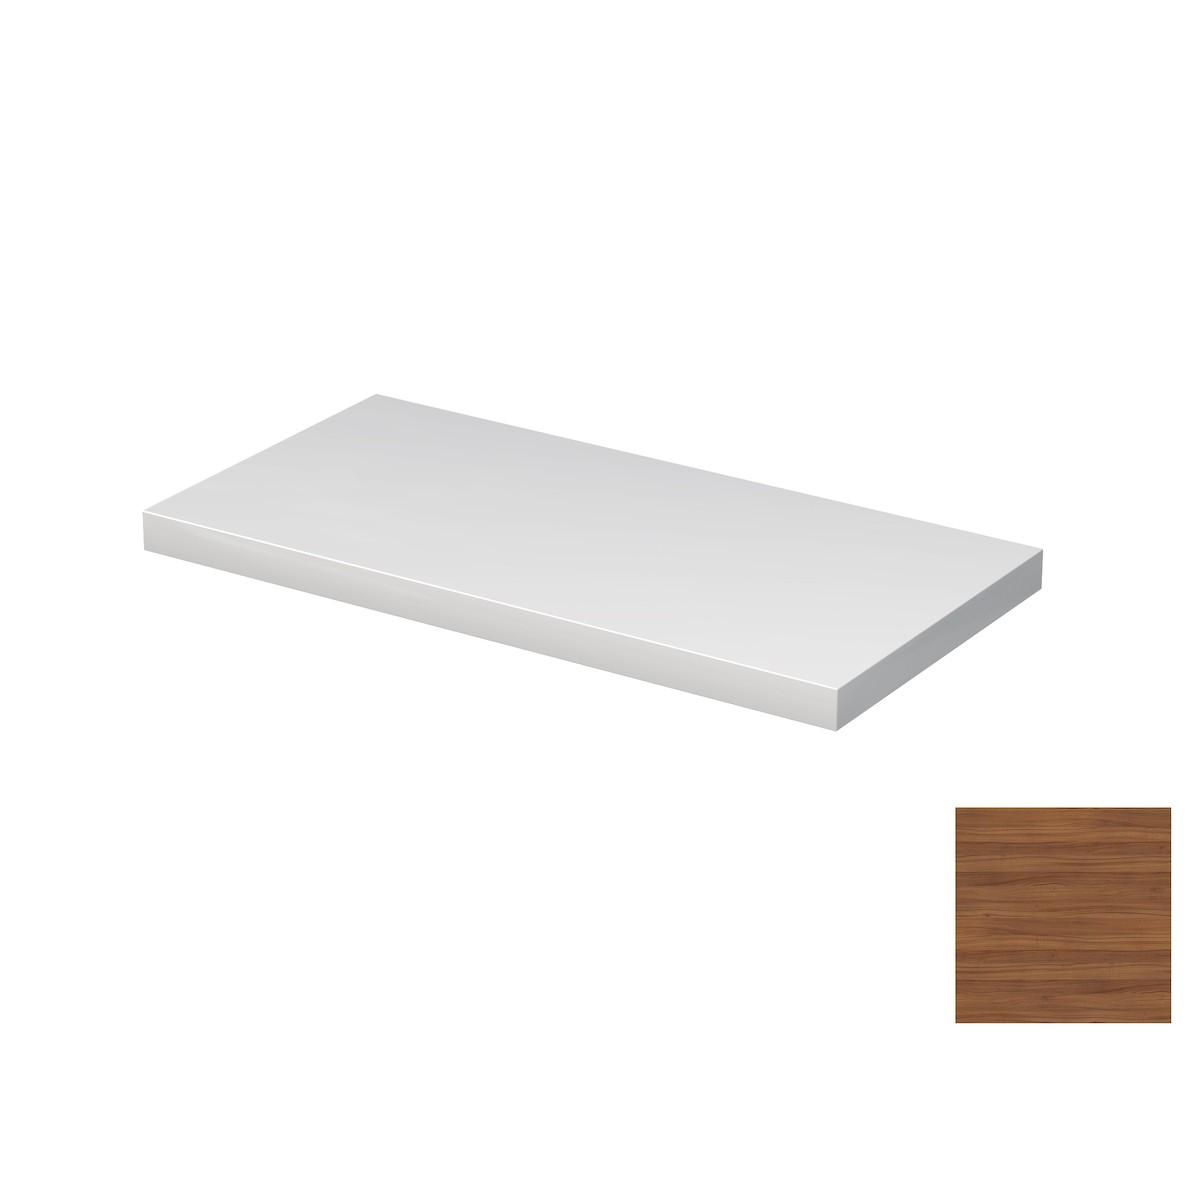 Deska pod umyvadlo Naturel Ratio 100x50x5,4cm DE54.100.37